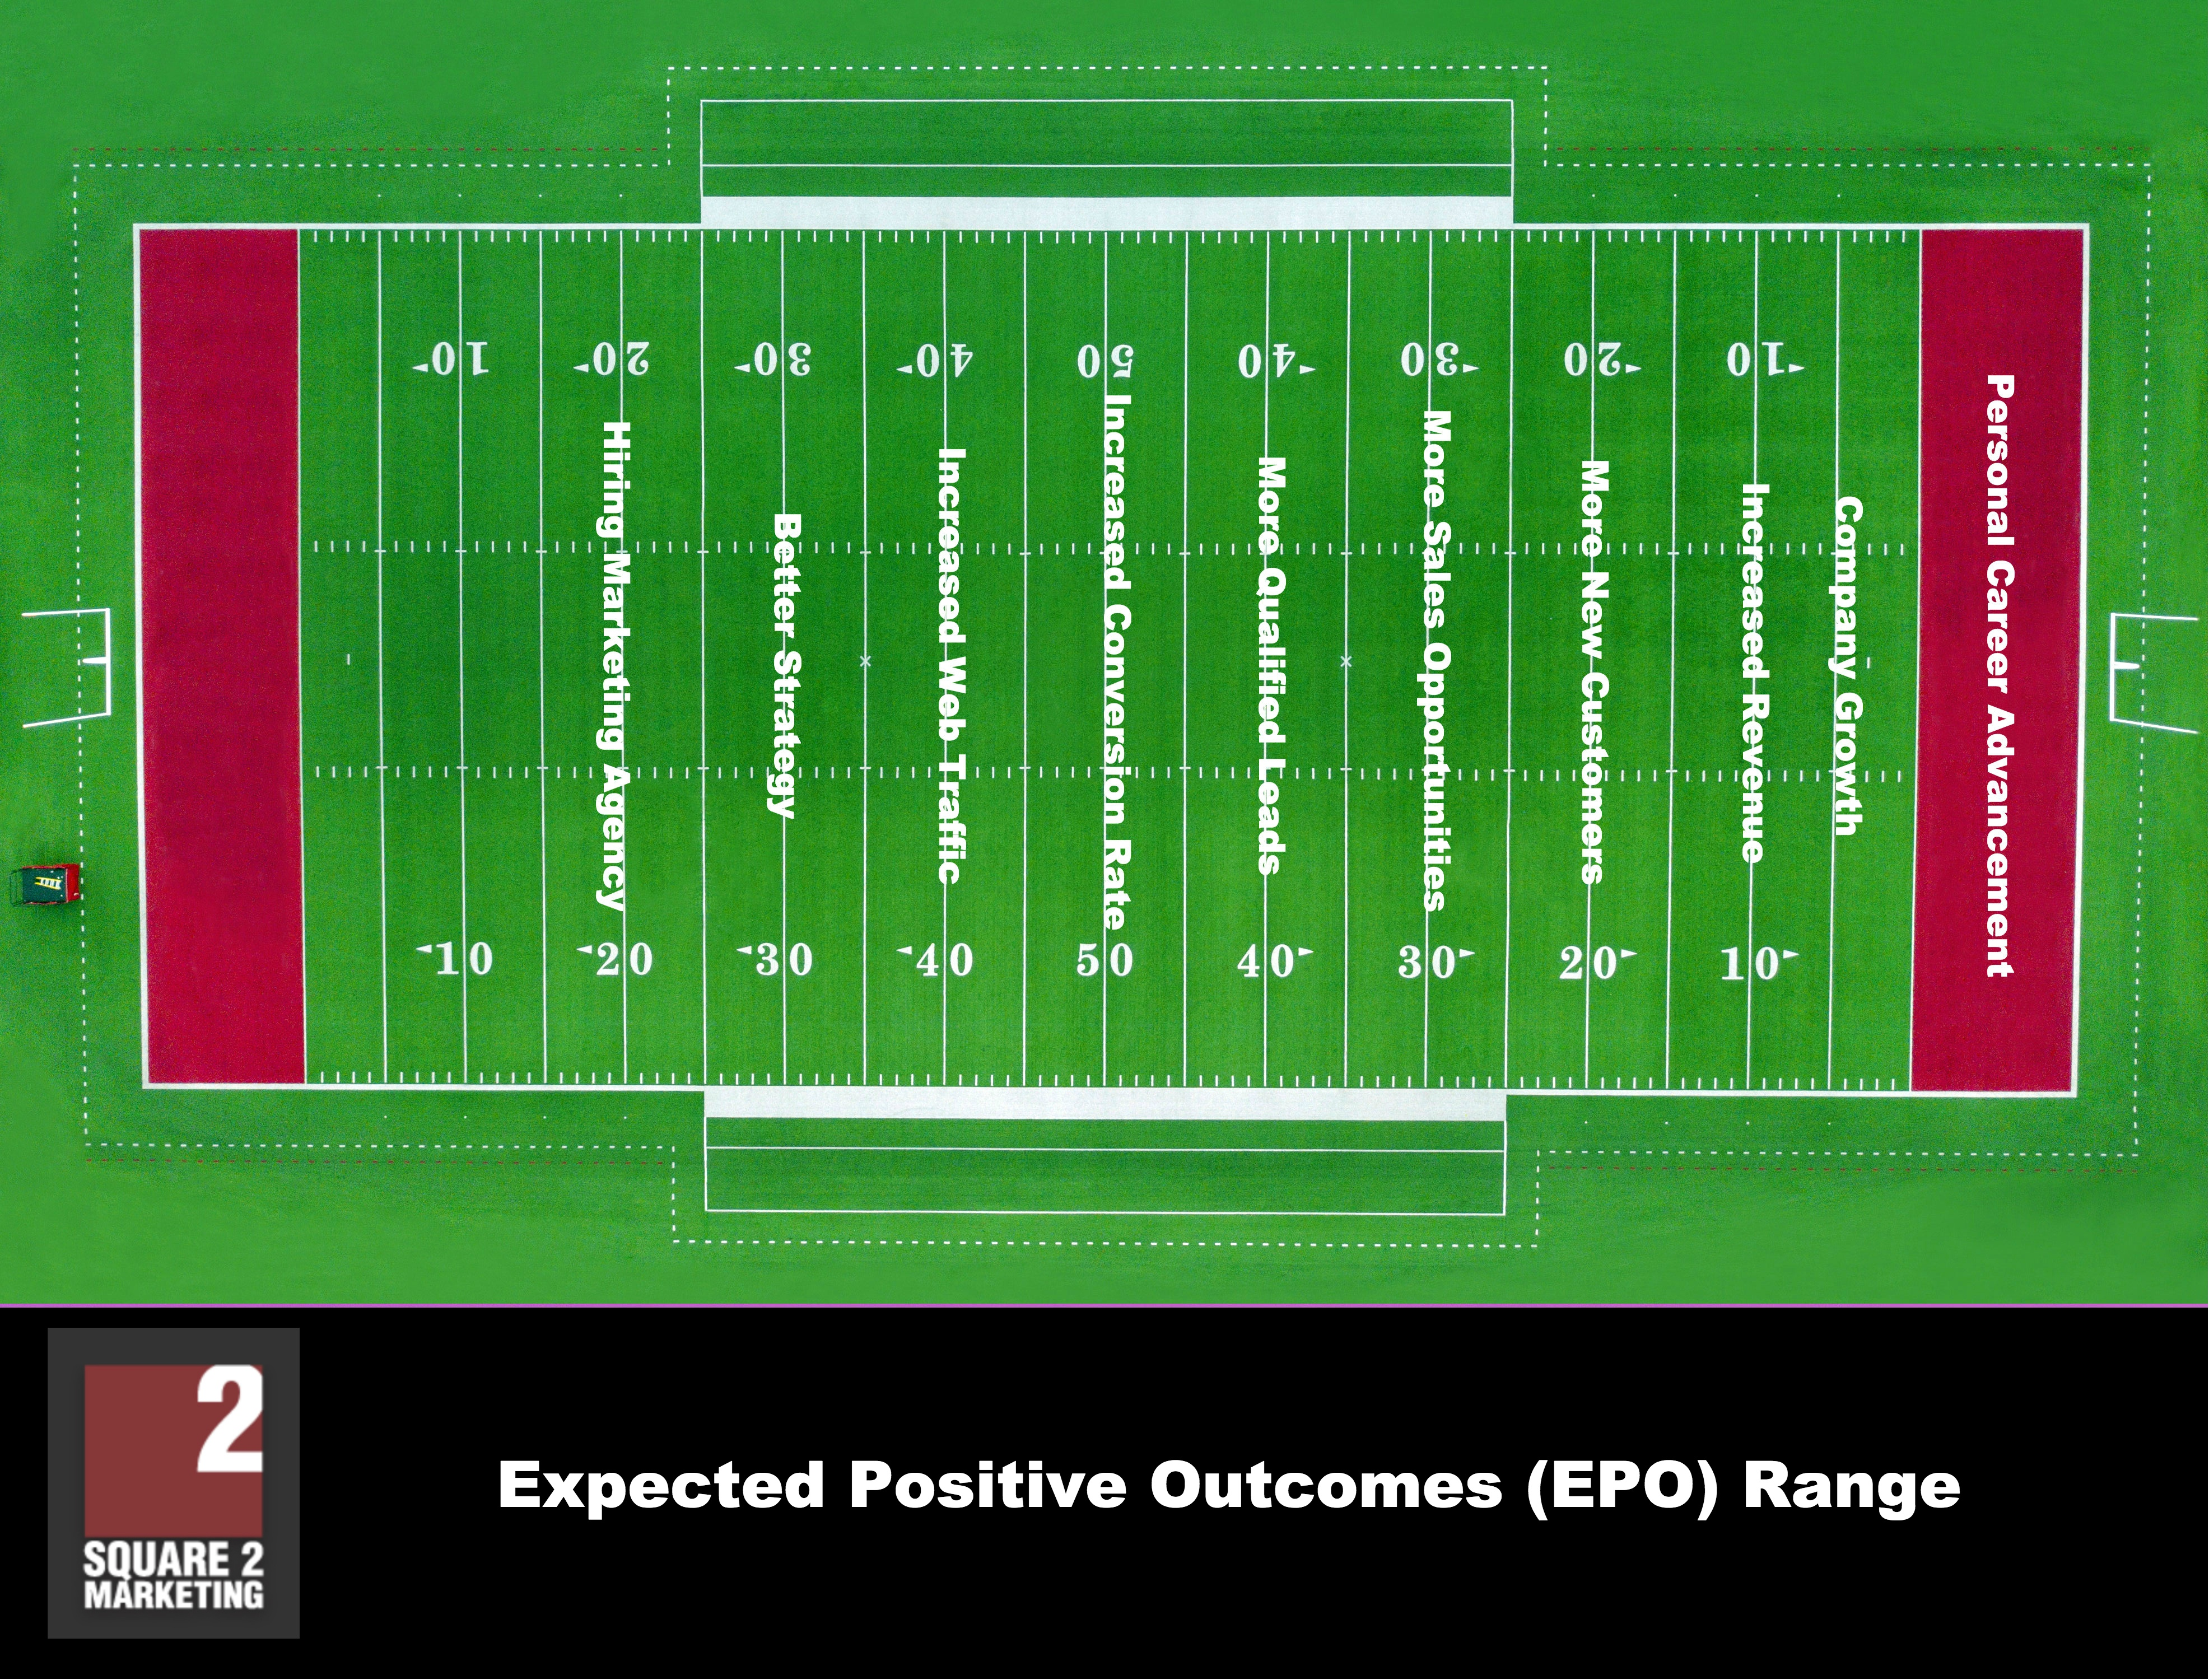 Expected-Positive-Outcomes-EPO-Range-Square-2-Marketing